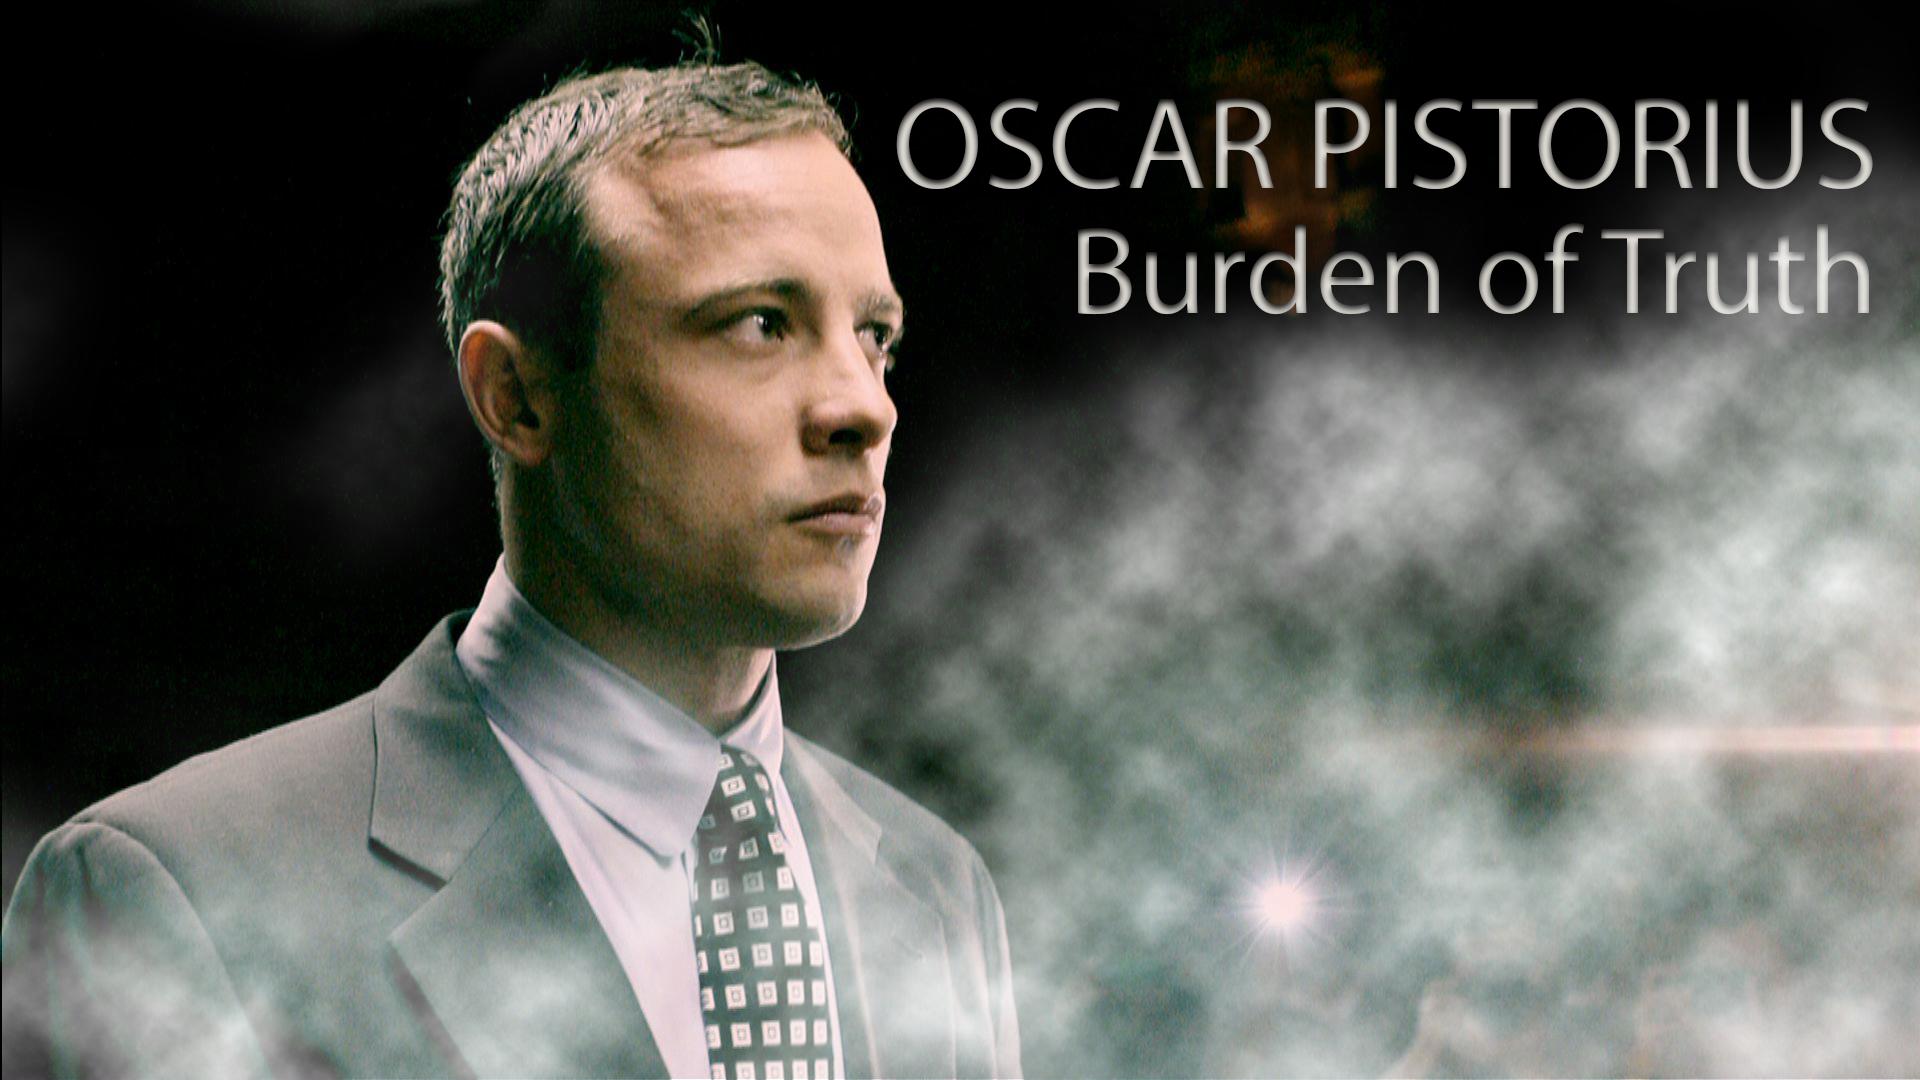 Oscar Pistorius: Burden of Truth